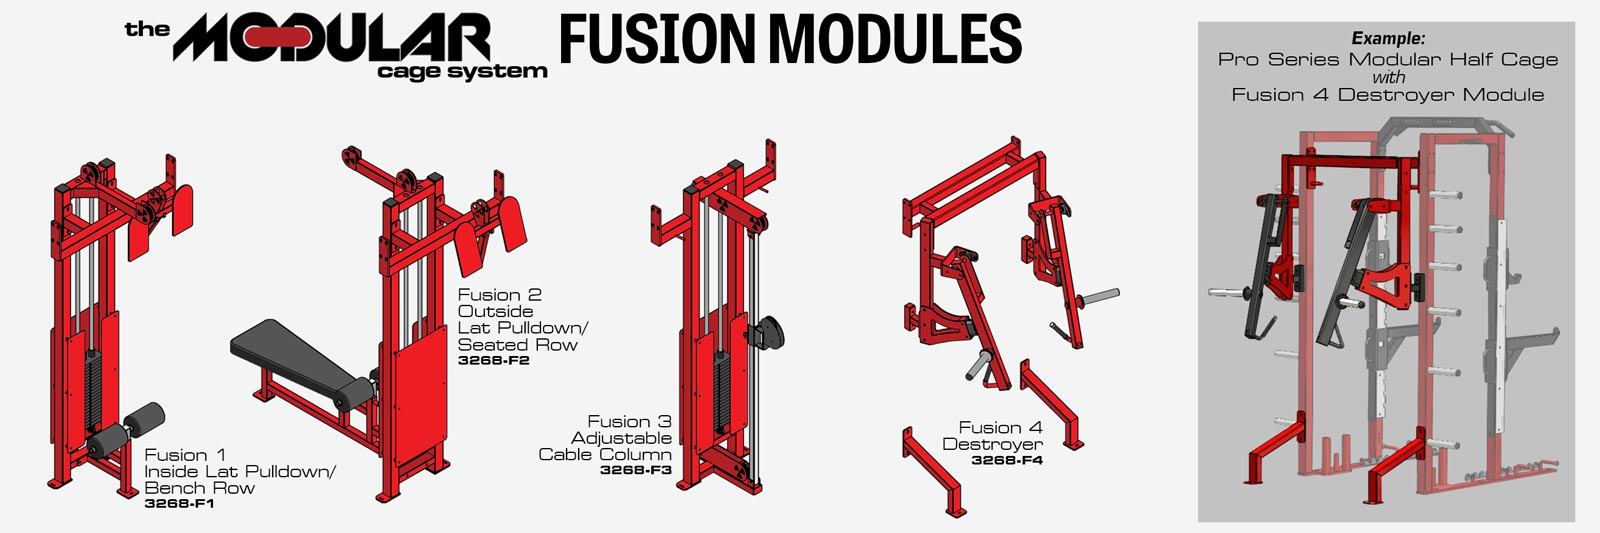 Modular System Fusion Modules